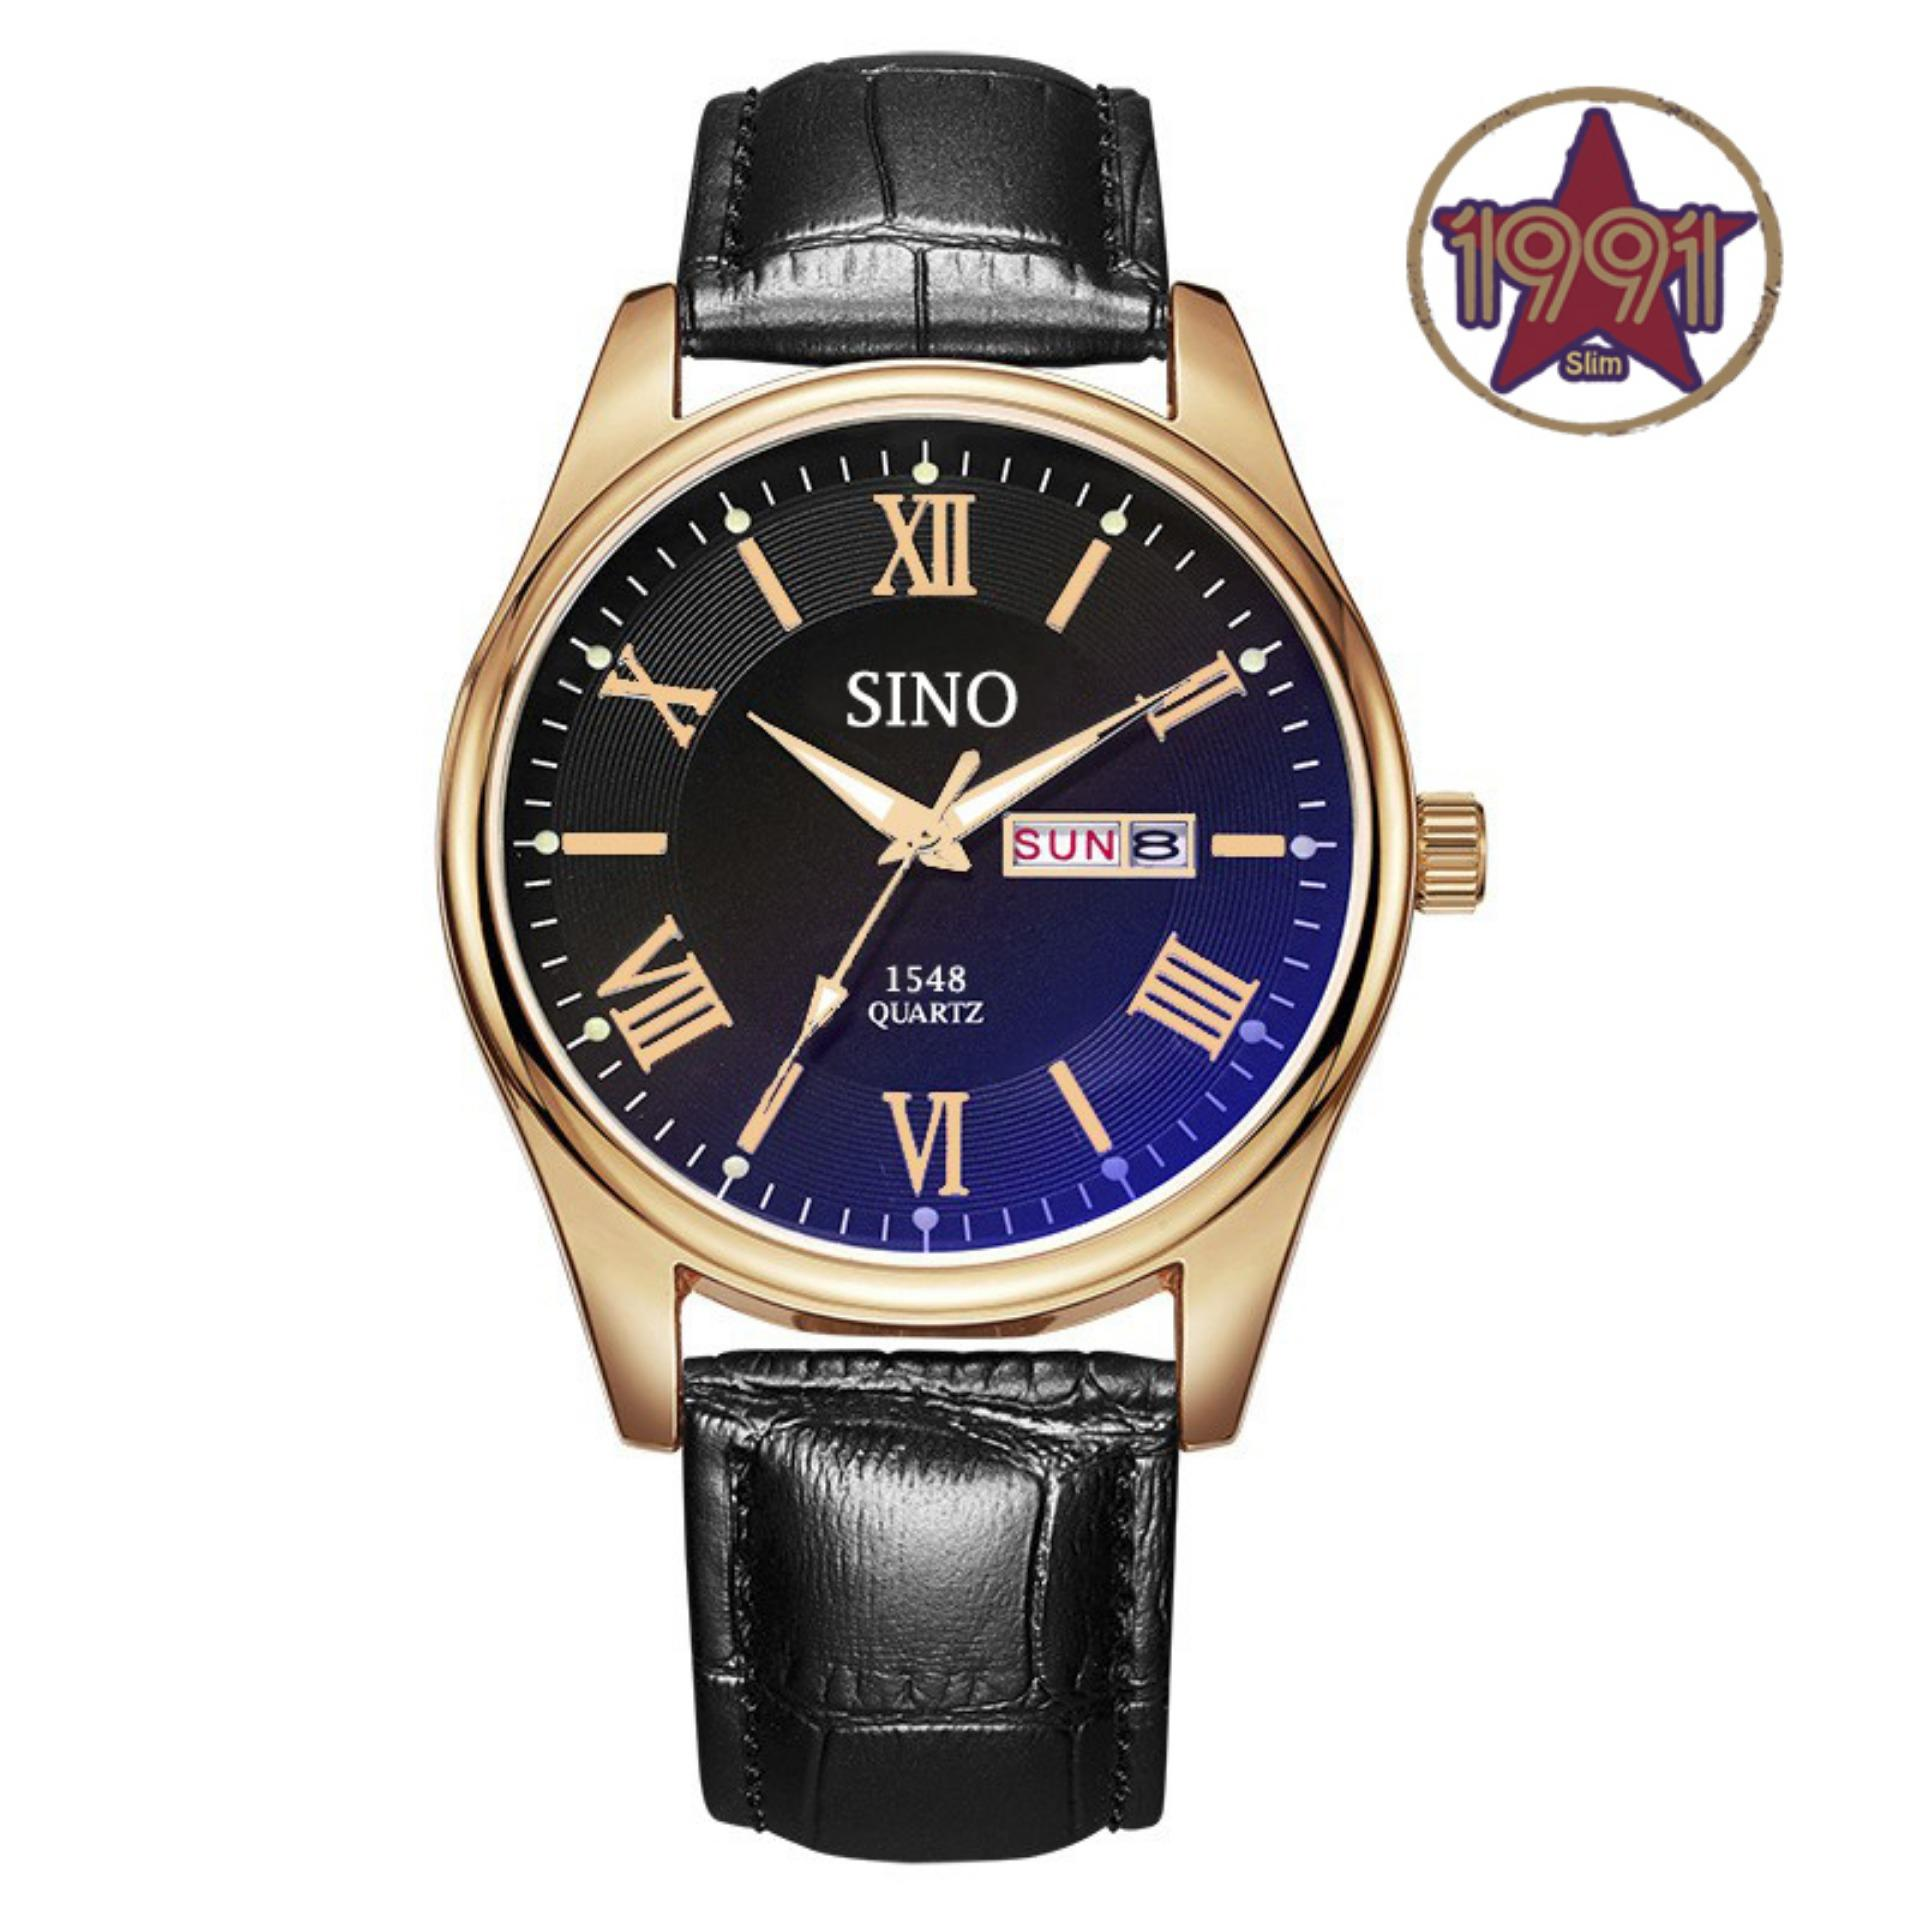 Đồng hồ nam dây da cao cấp Sino Japan Movt rose gold S1548